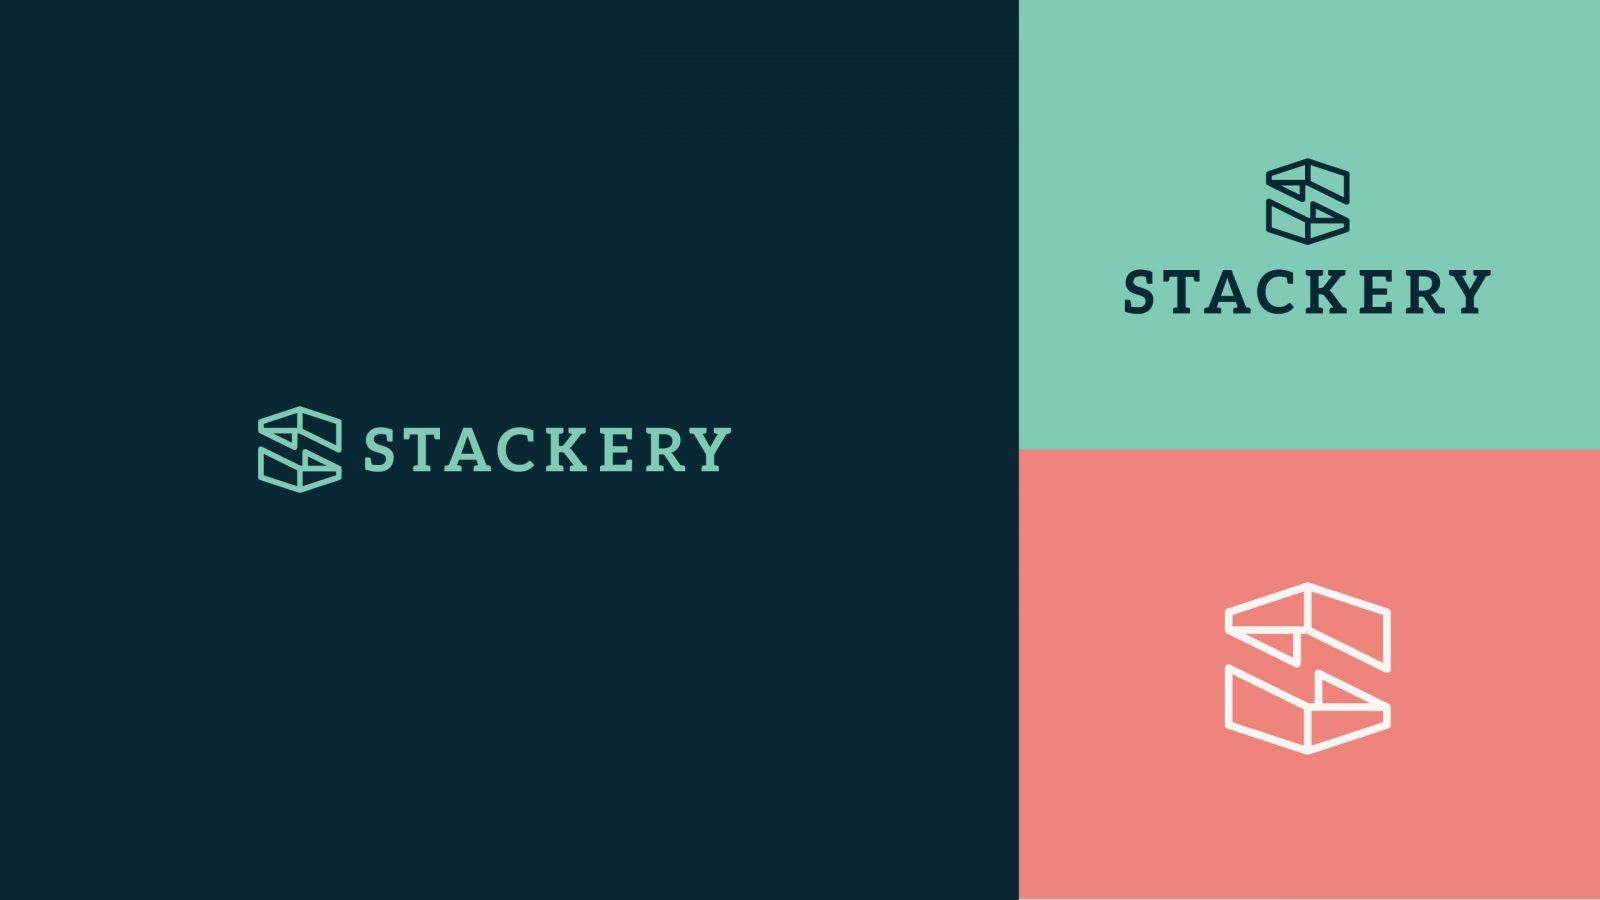 Stackery Startup Logo